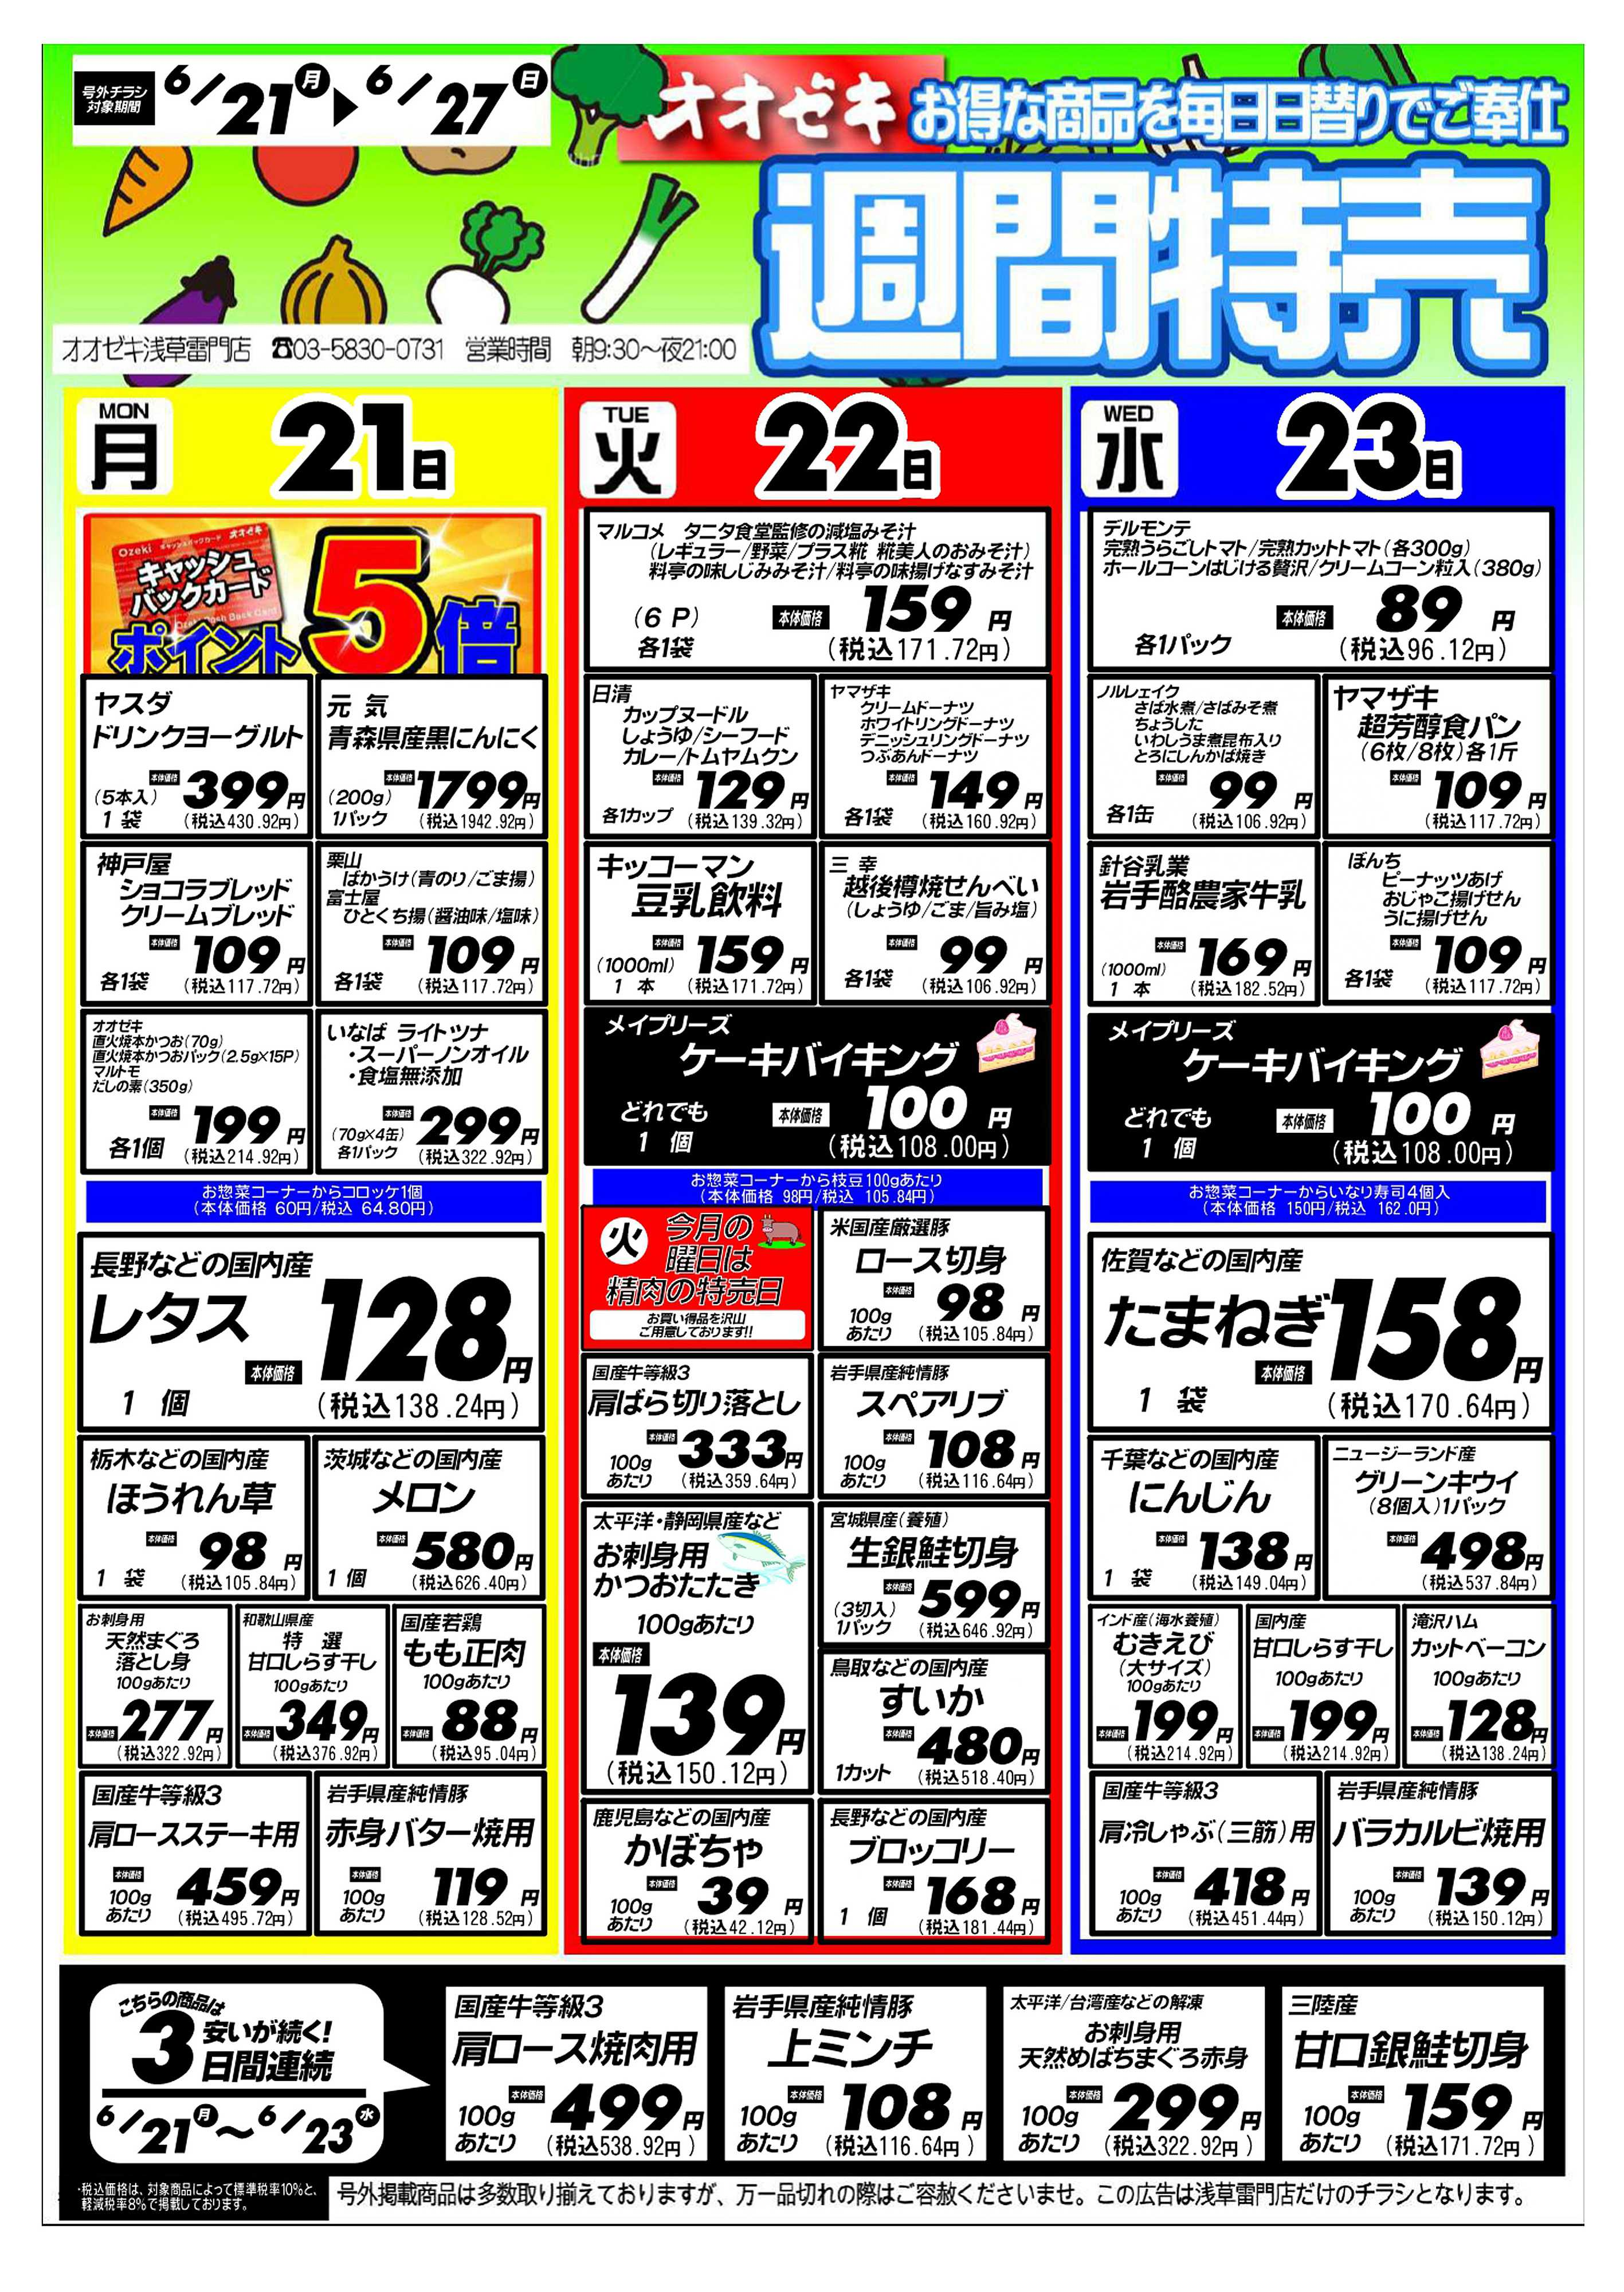 オオゼキ 浅草雷門店 週間特売